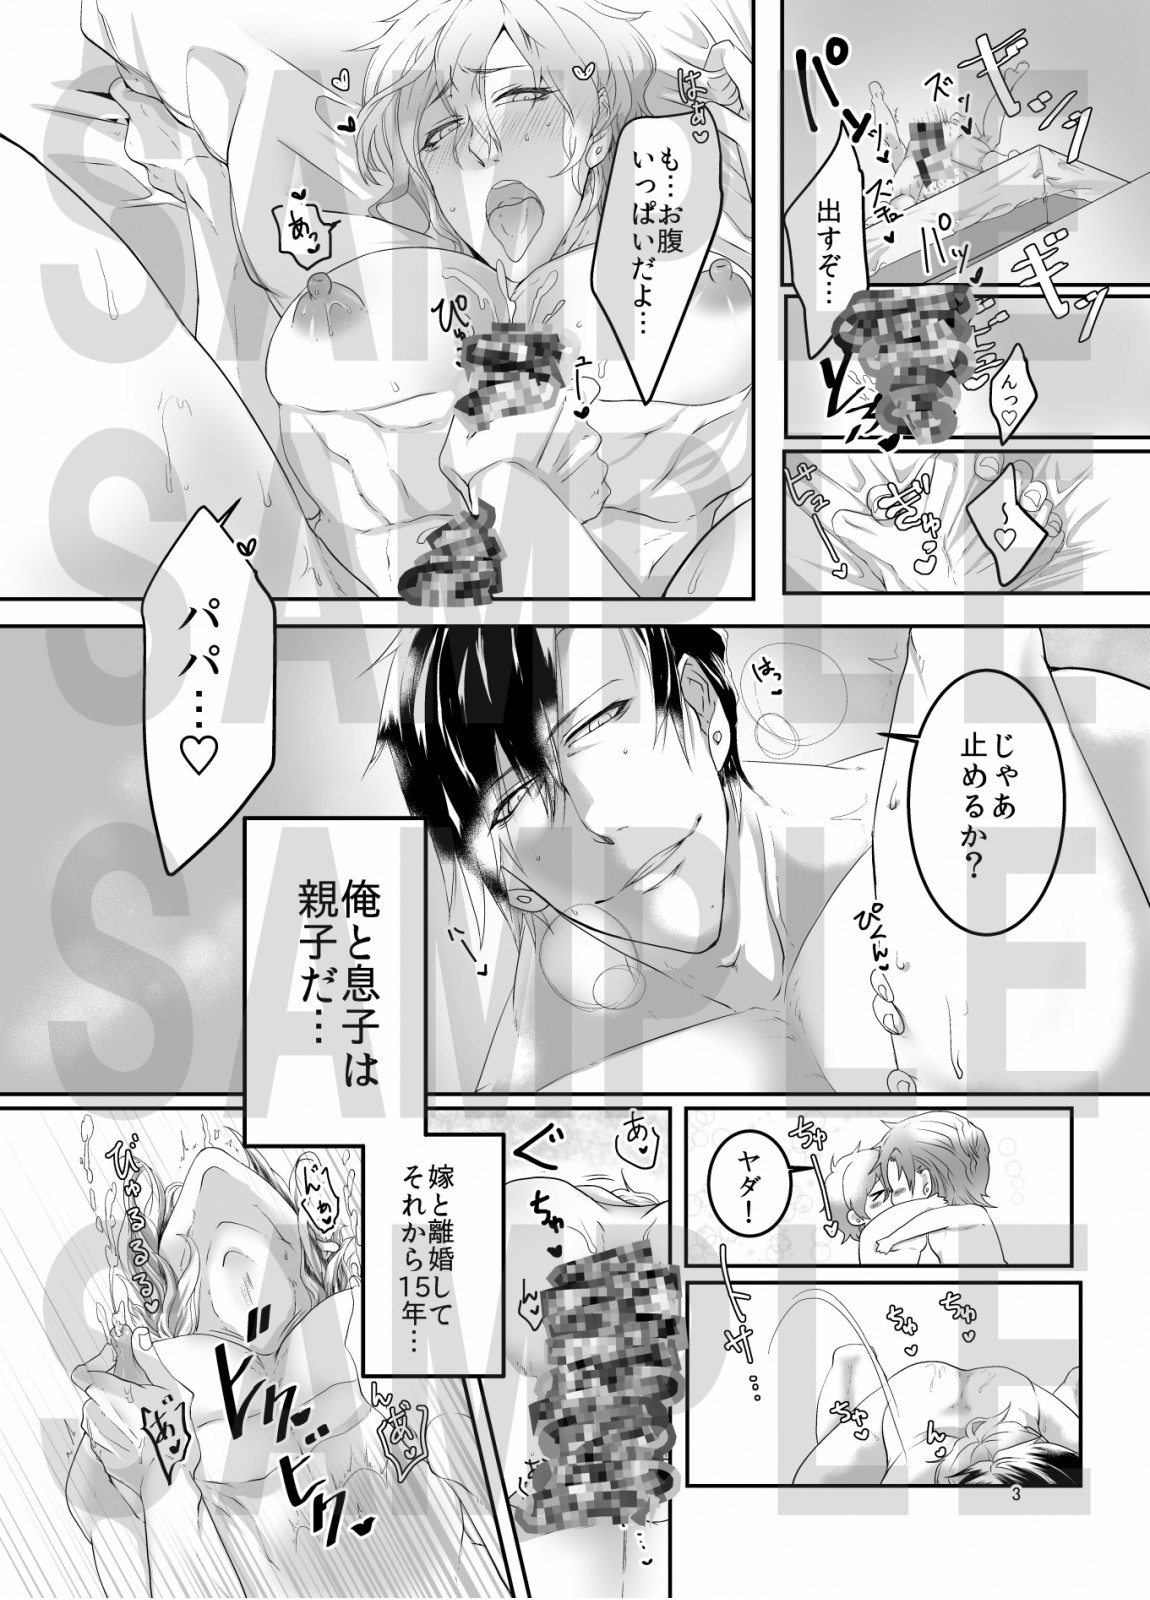 Bl 漫画 責め 乳首